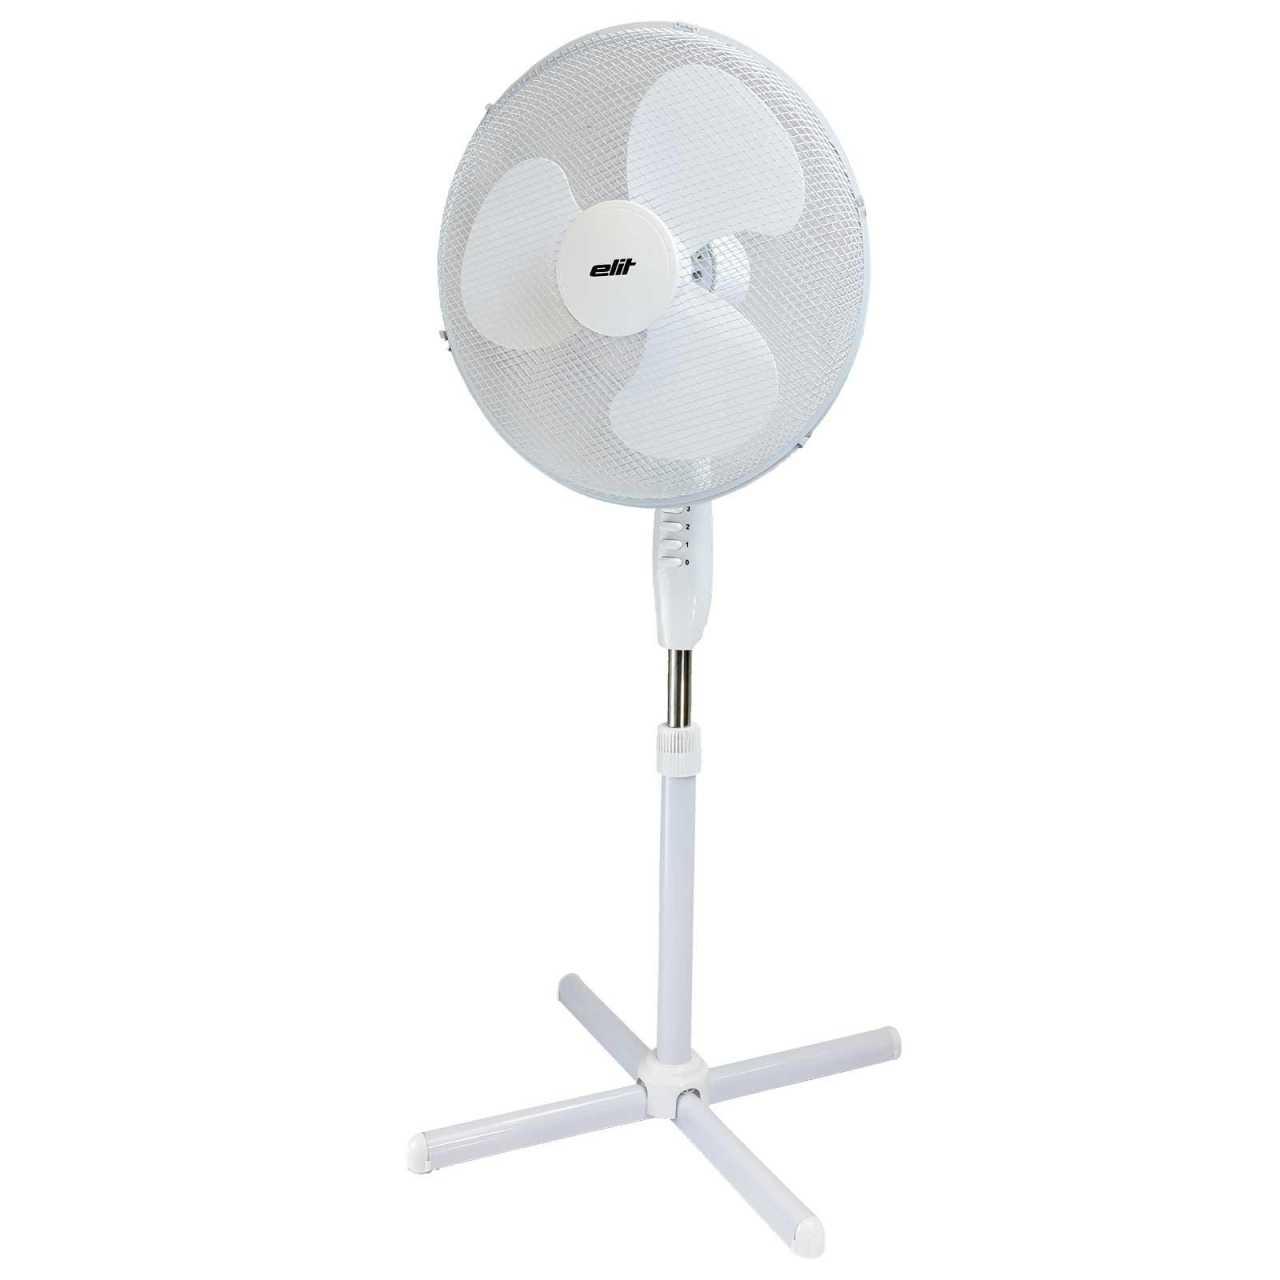 2x Standventilator Windmaschine 90° oszillierend Lüfter Ventilator 45W Ø40cm